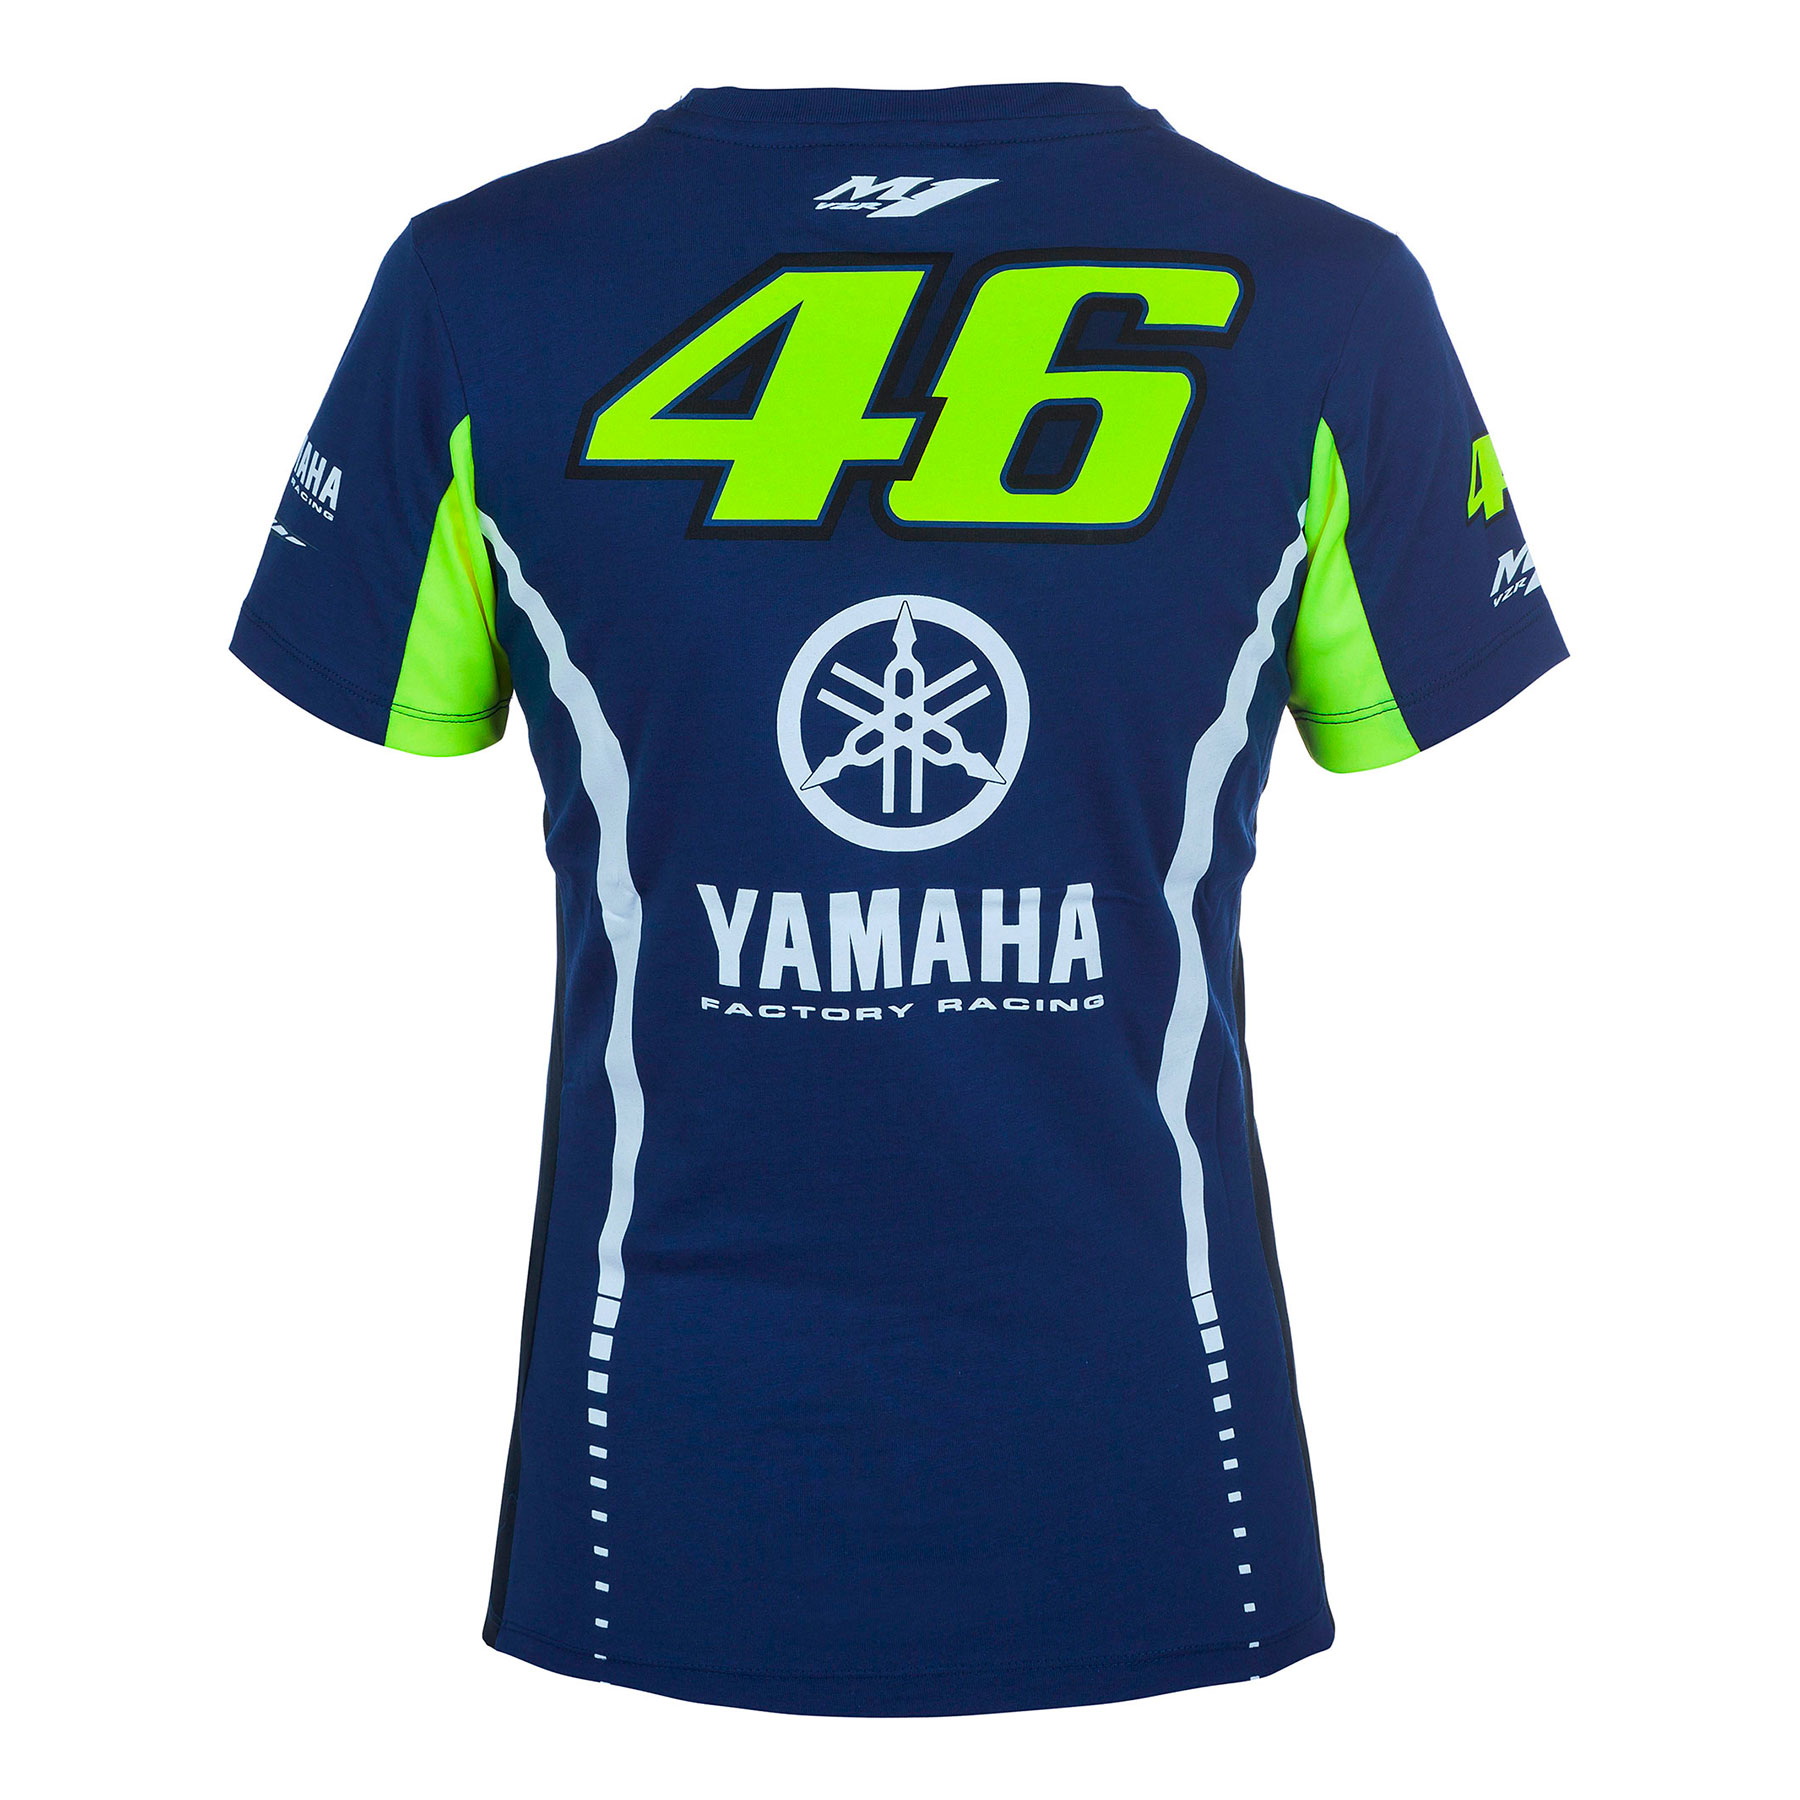 8195dad495 Camiseta Valentino Rossi Yamaha VR46 Mujer Oficial 2017 en Motorbike ...